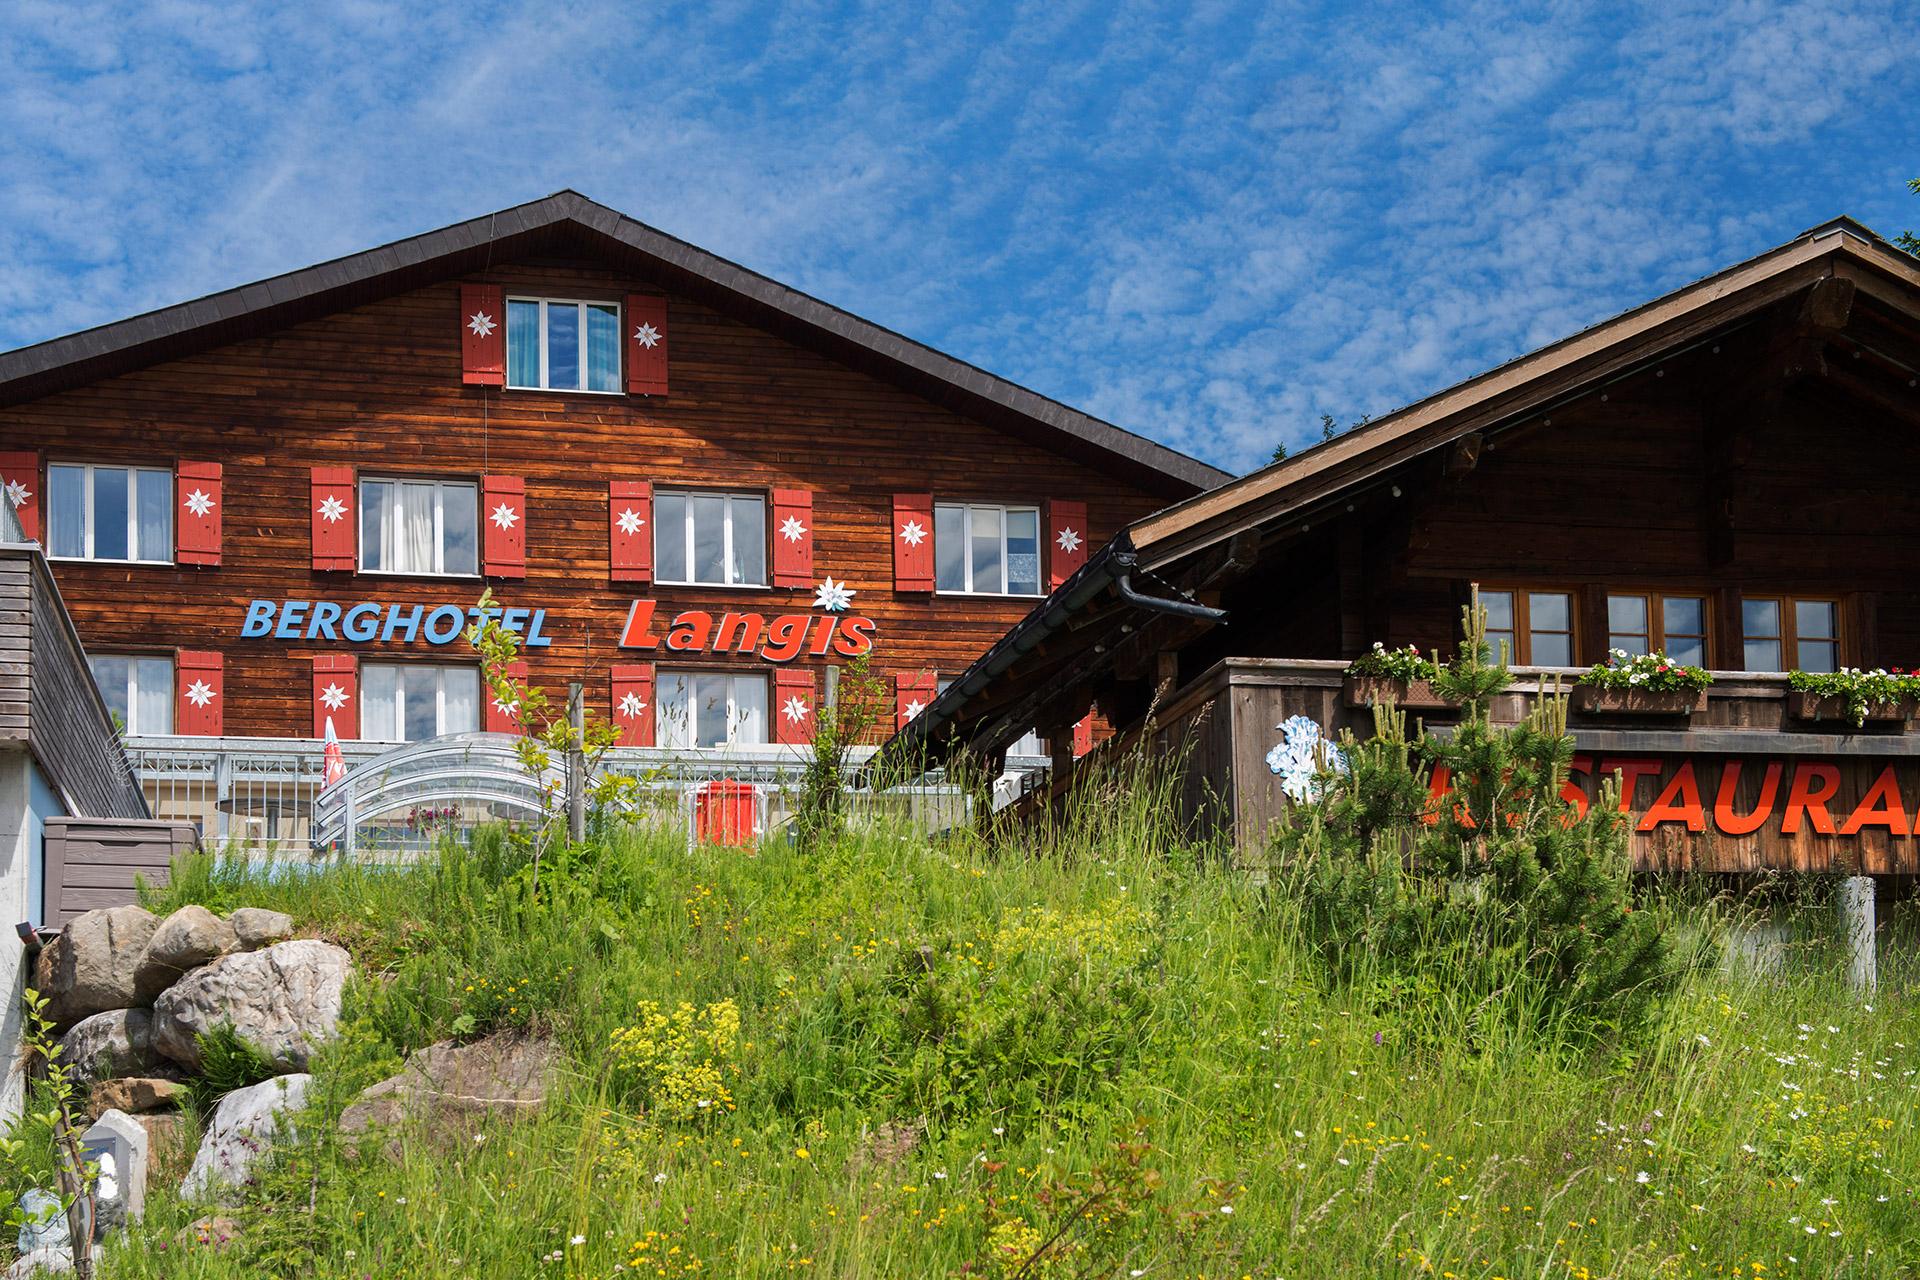 Willkommen im Berghotel Langis